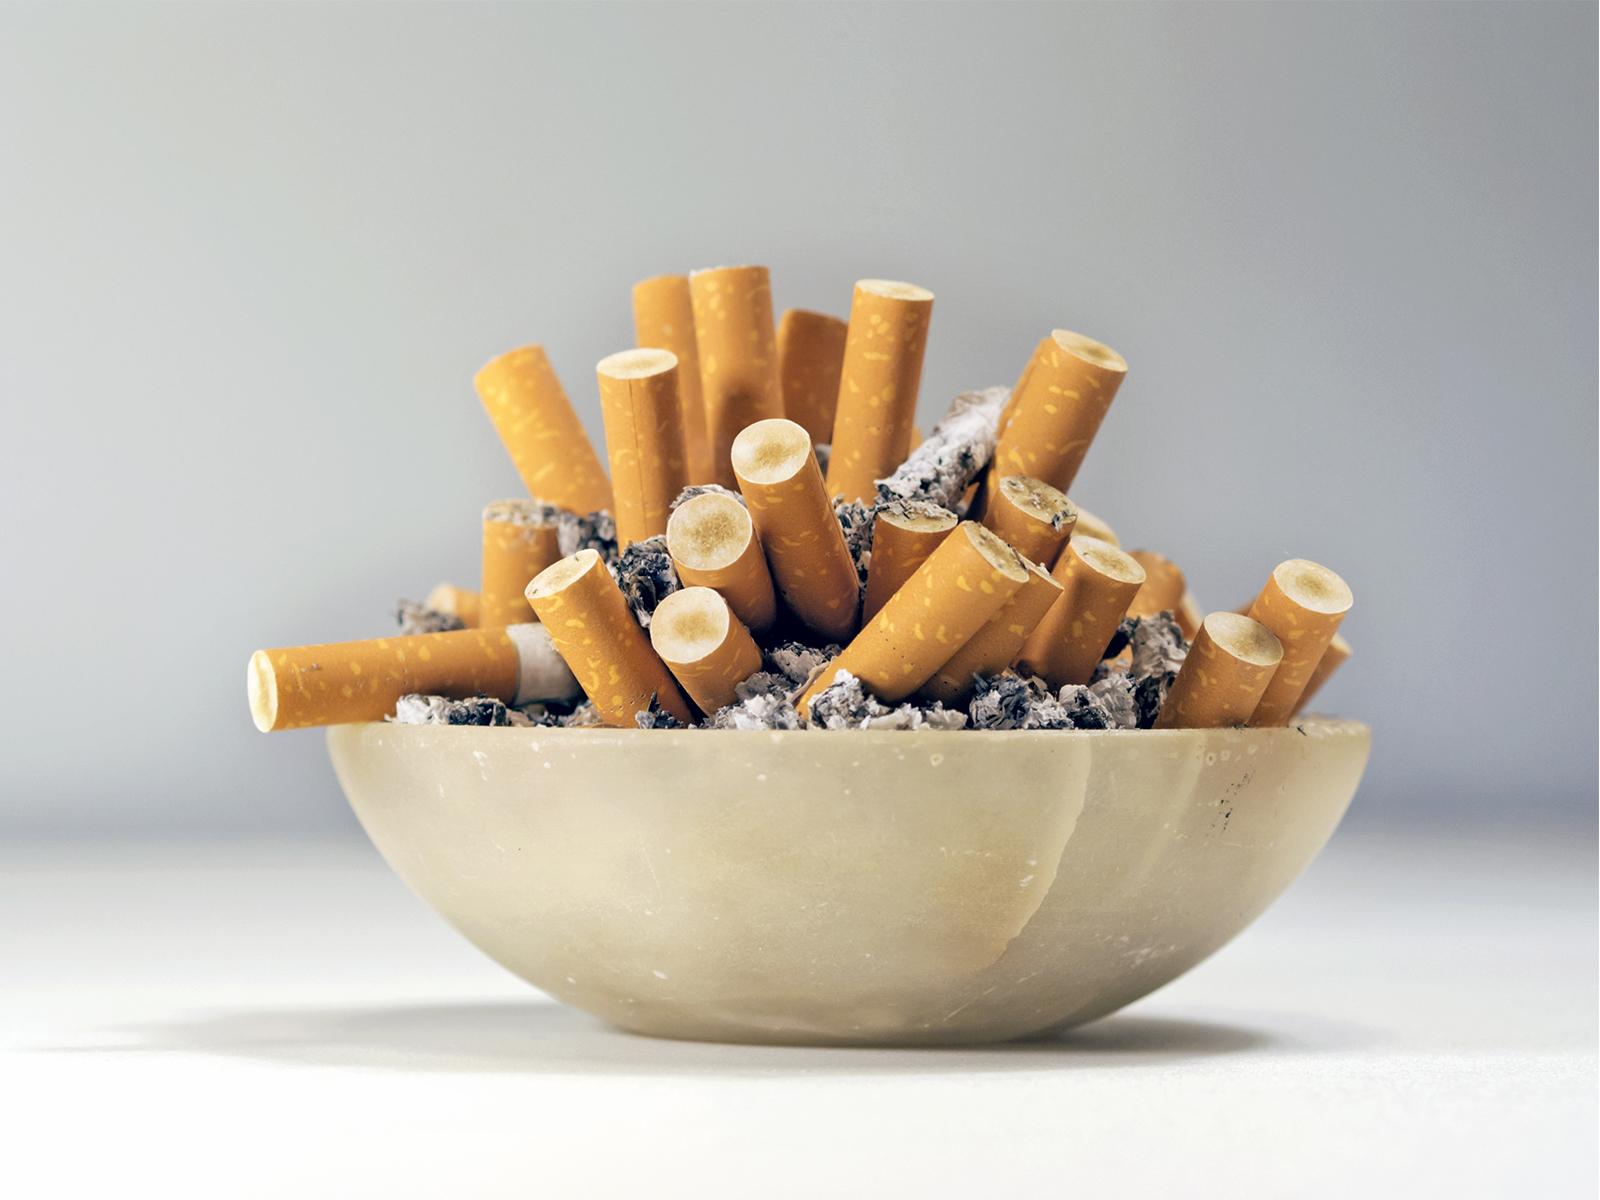 hagyja abba a cigarettázást is